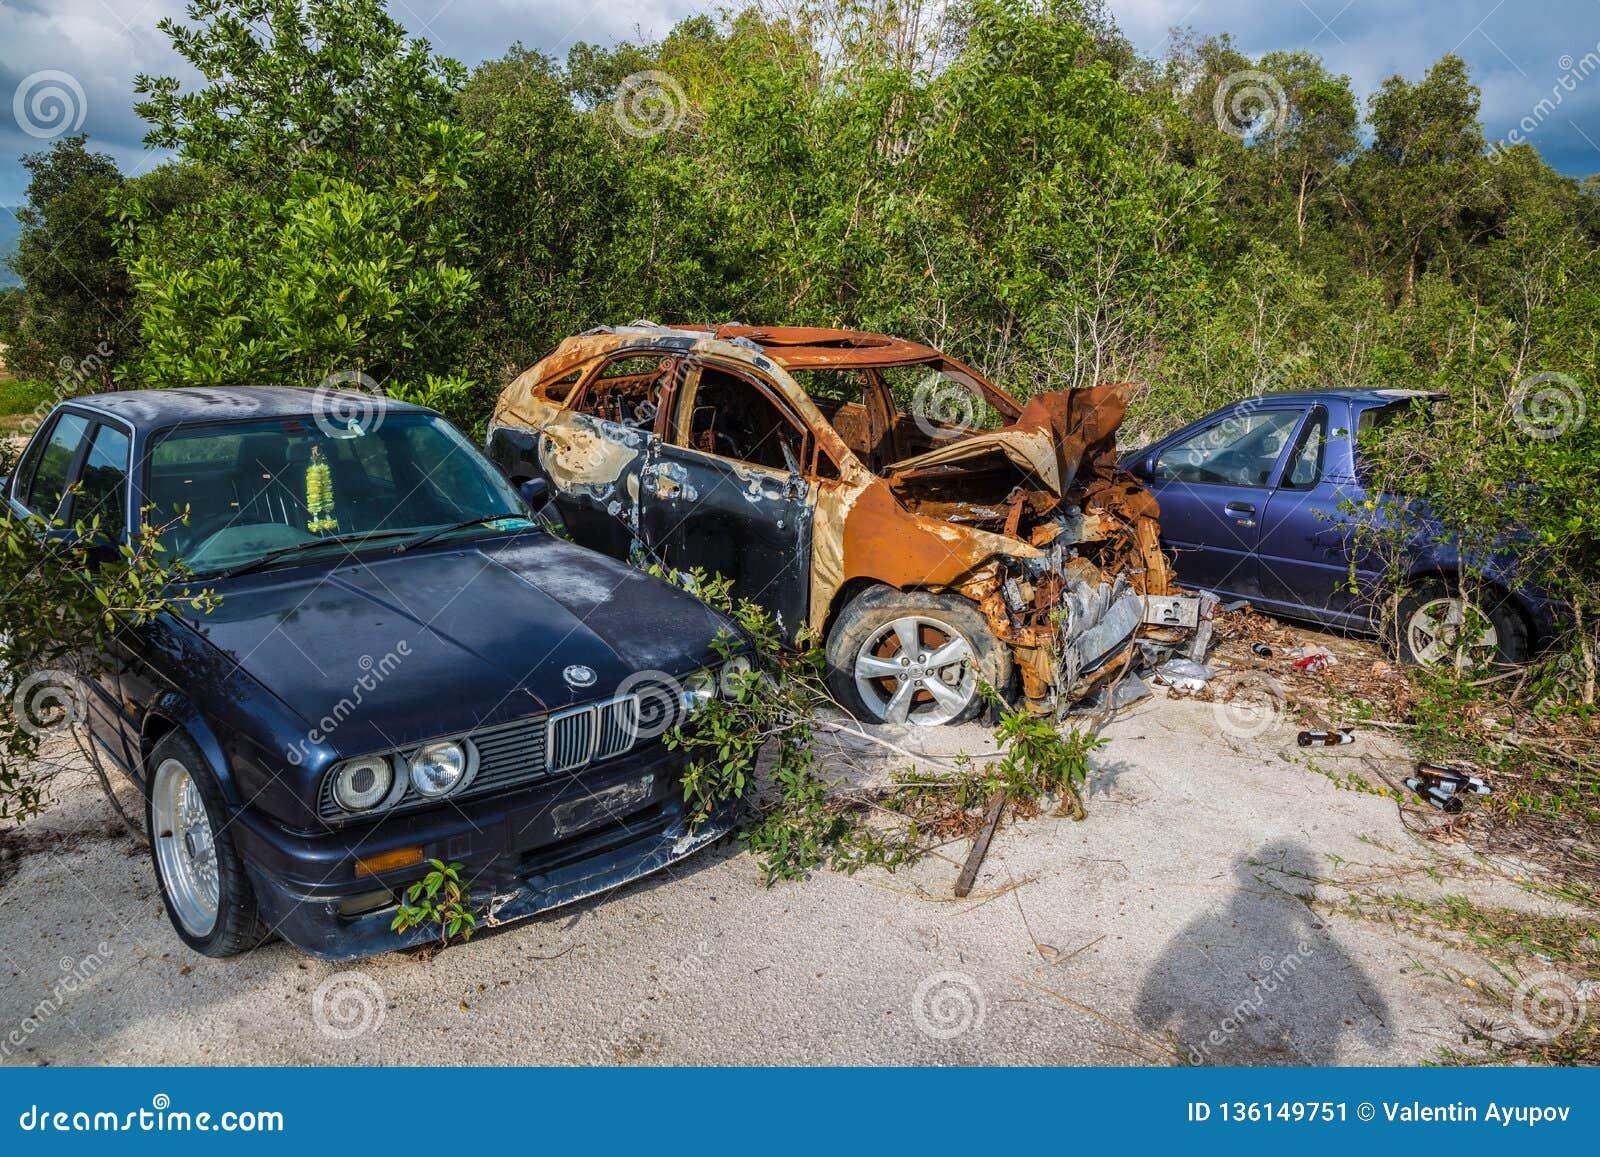 Broken Cars In A Dump In The Field On Koh Samui In Thailand